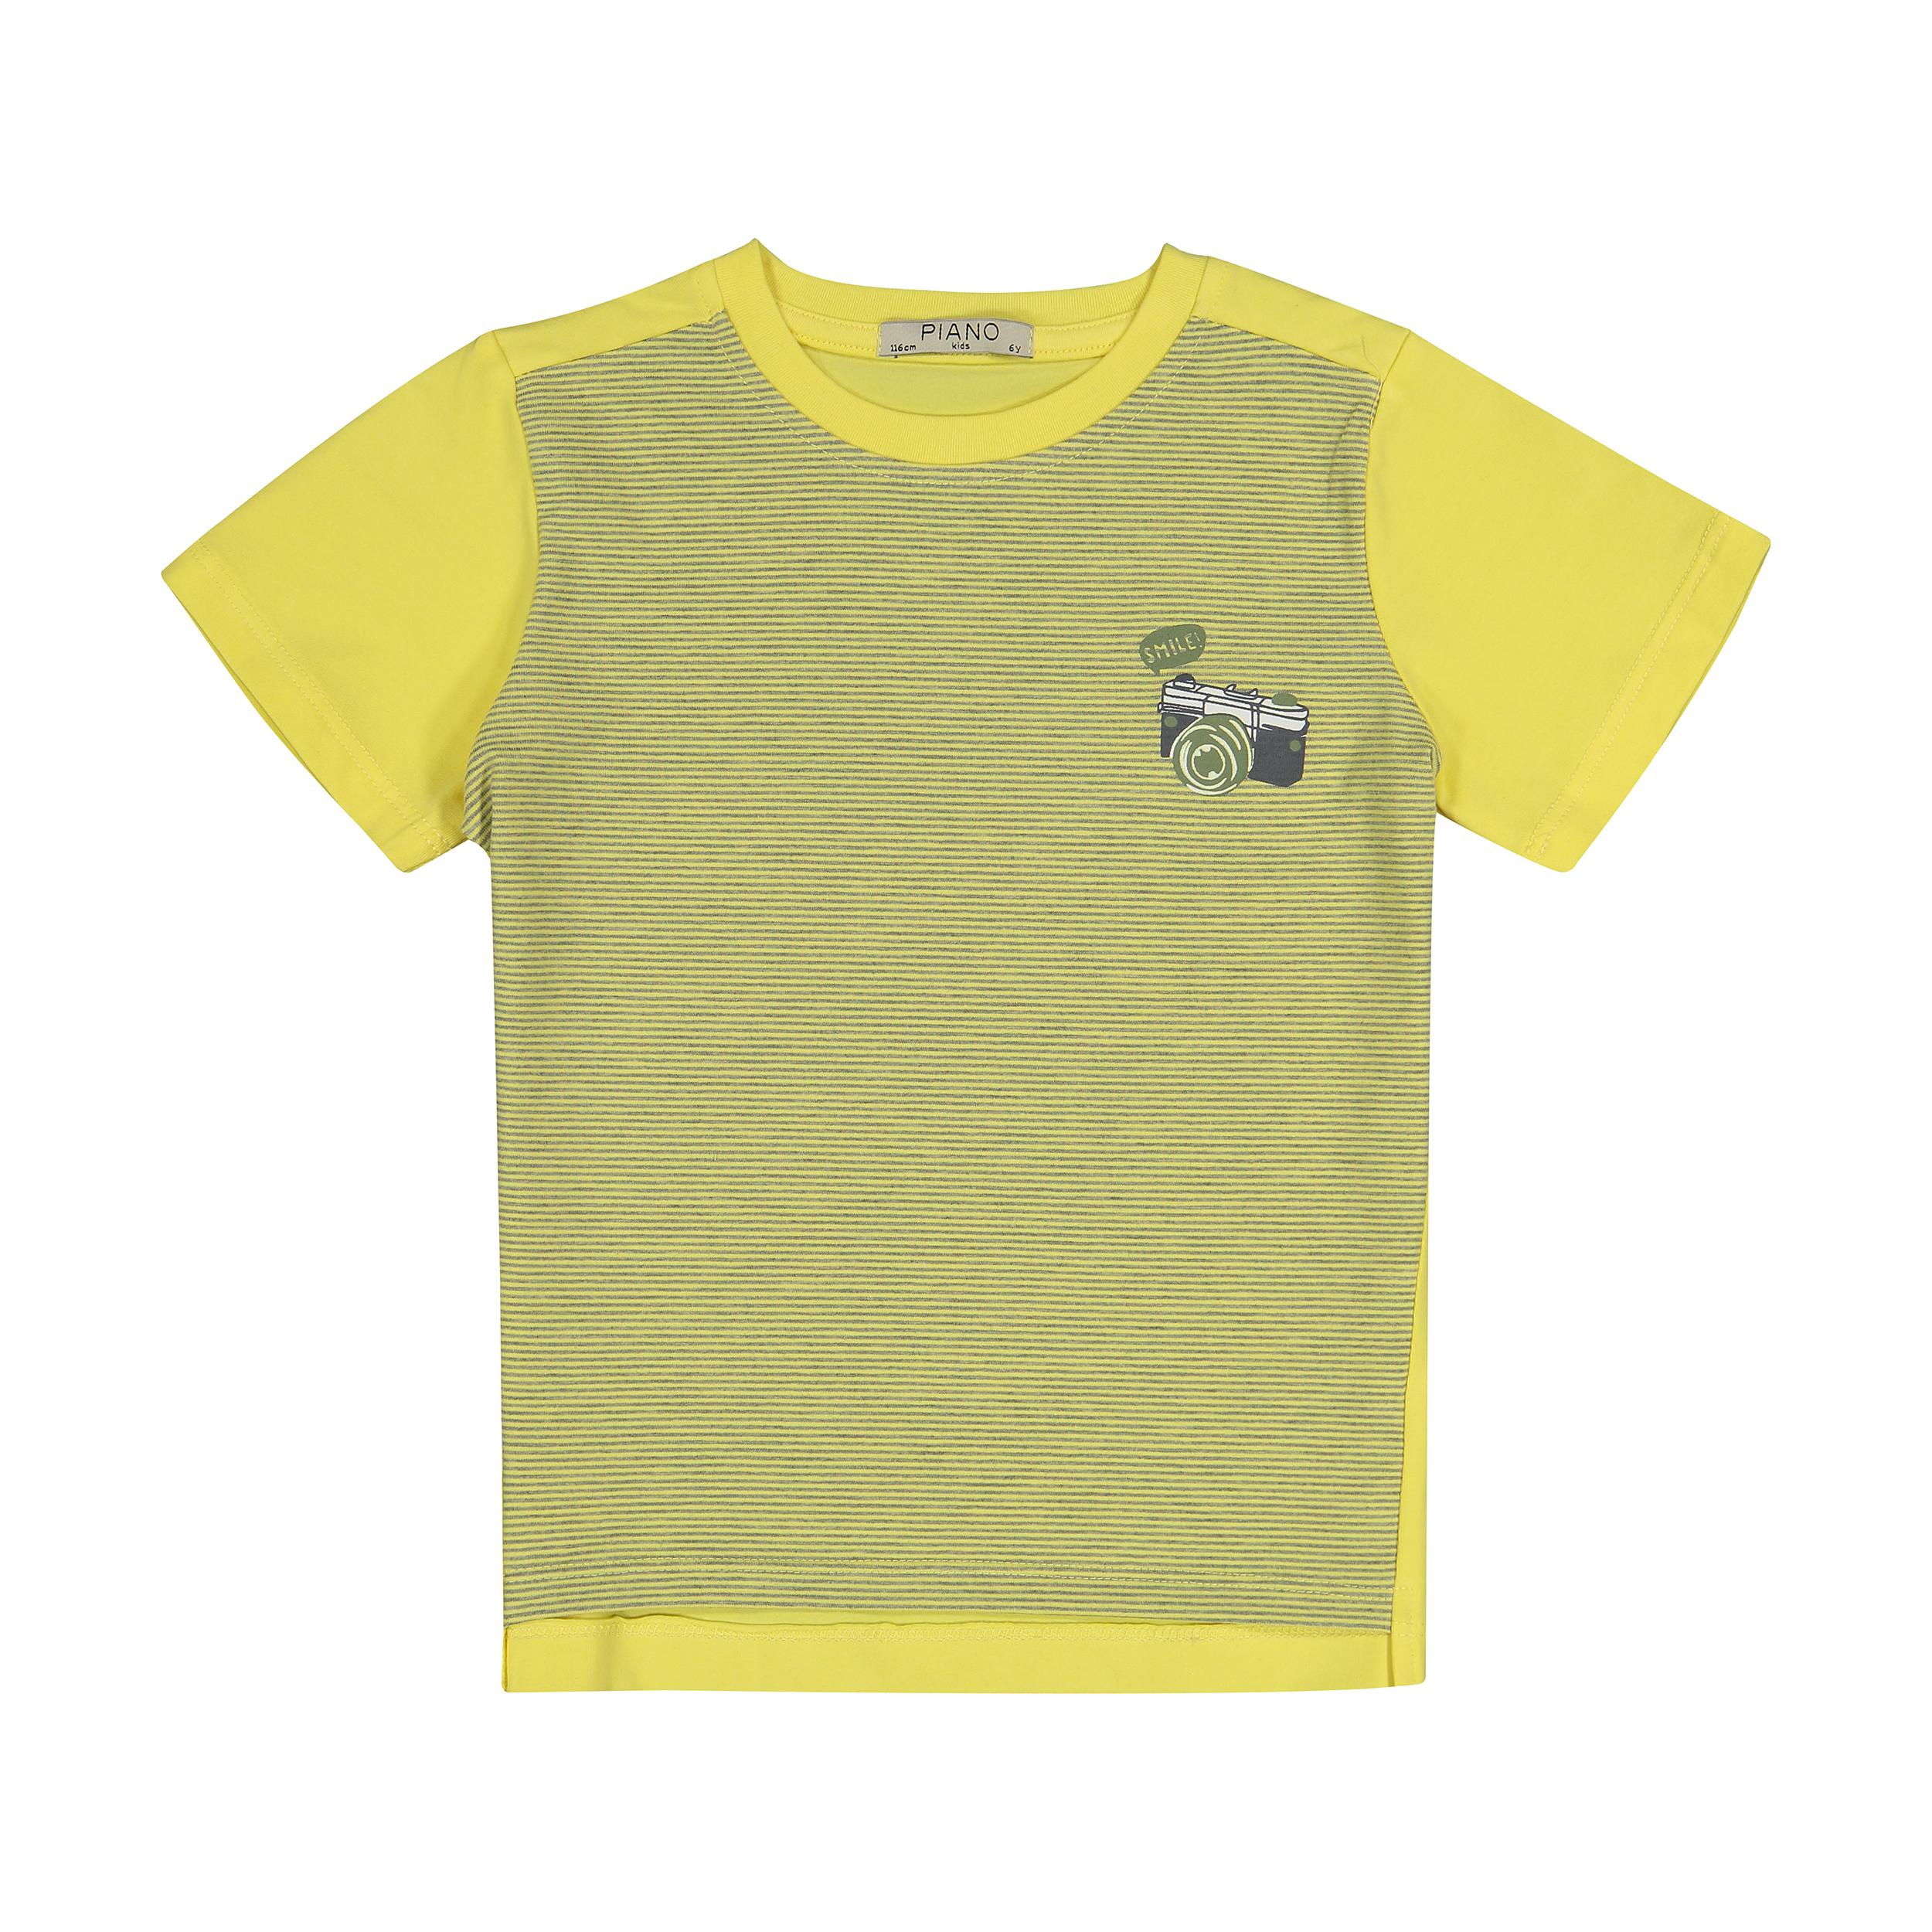 تی شرت پسرانه پیانو مدل 01523-16